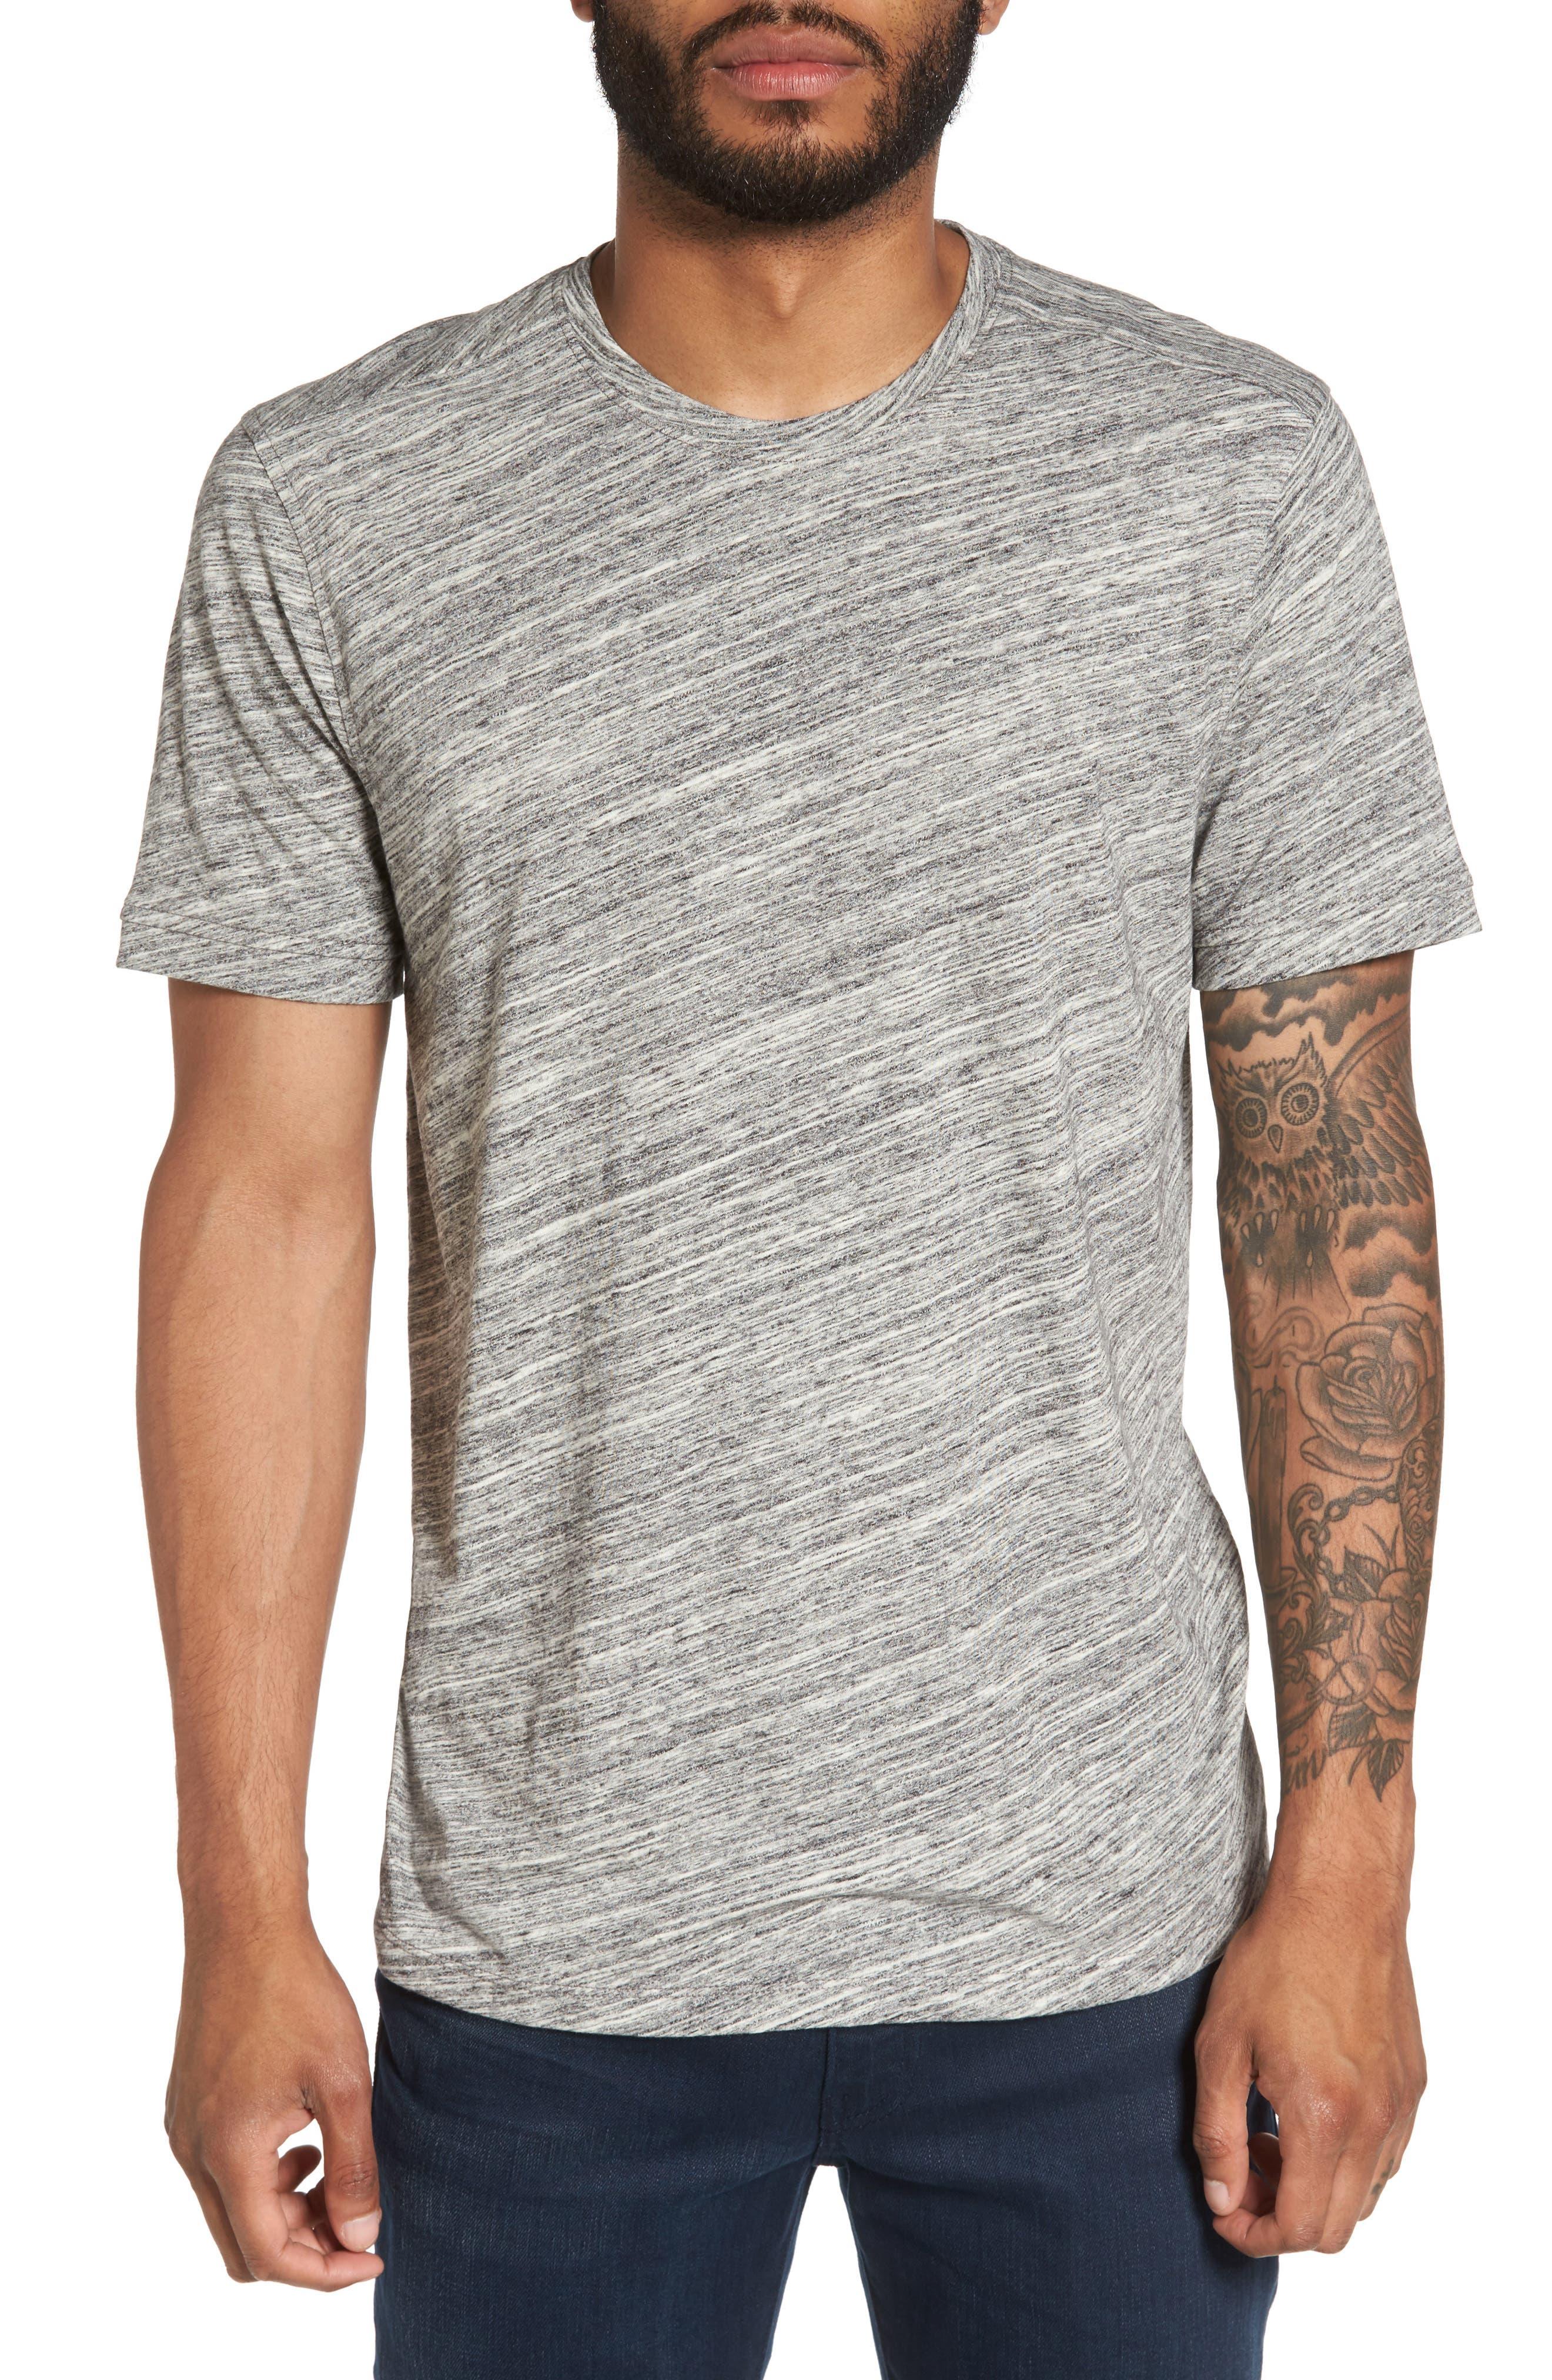 Texture T-Shirt,                         Main,                         color, Ivory Egret Spacedye